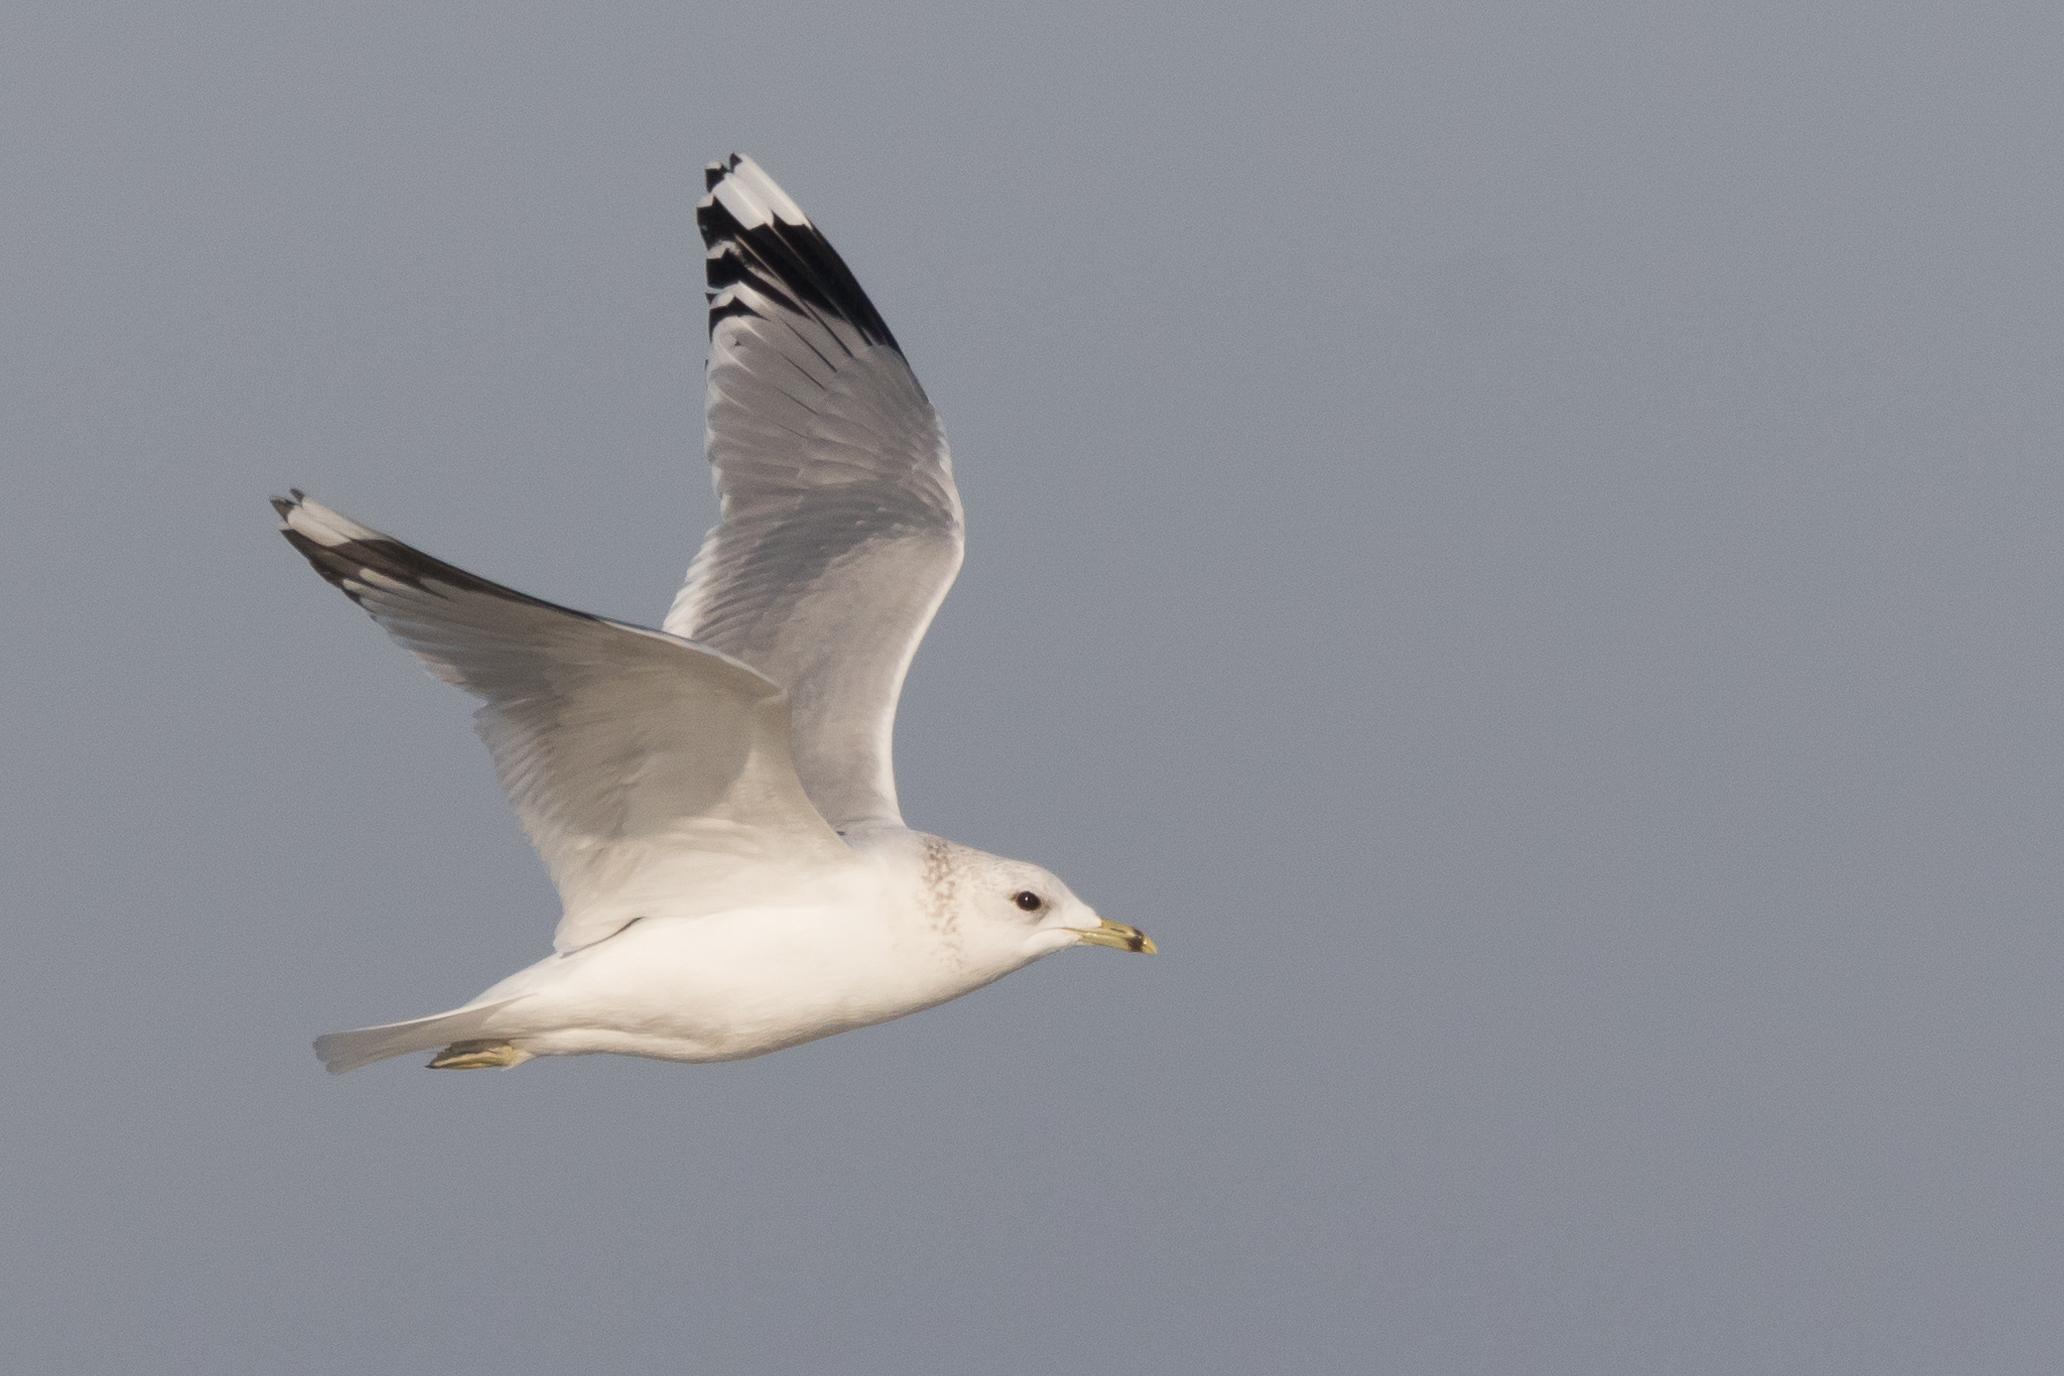 20170121-Common Gull Adult-81.jpg